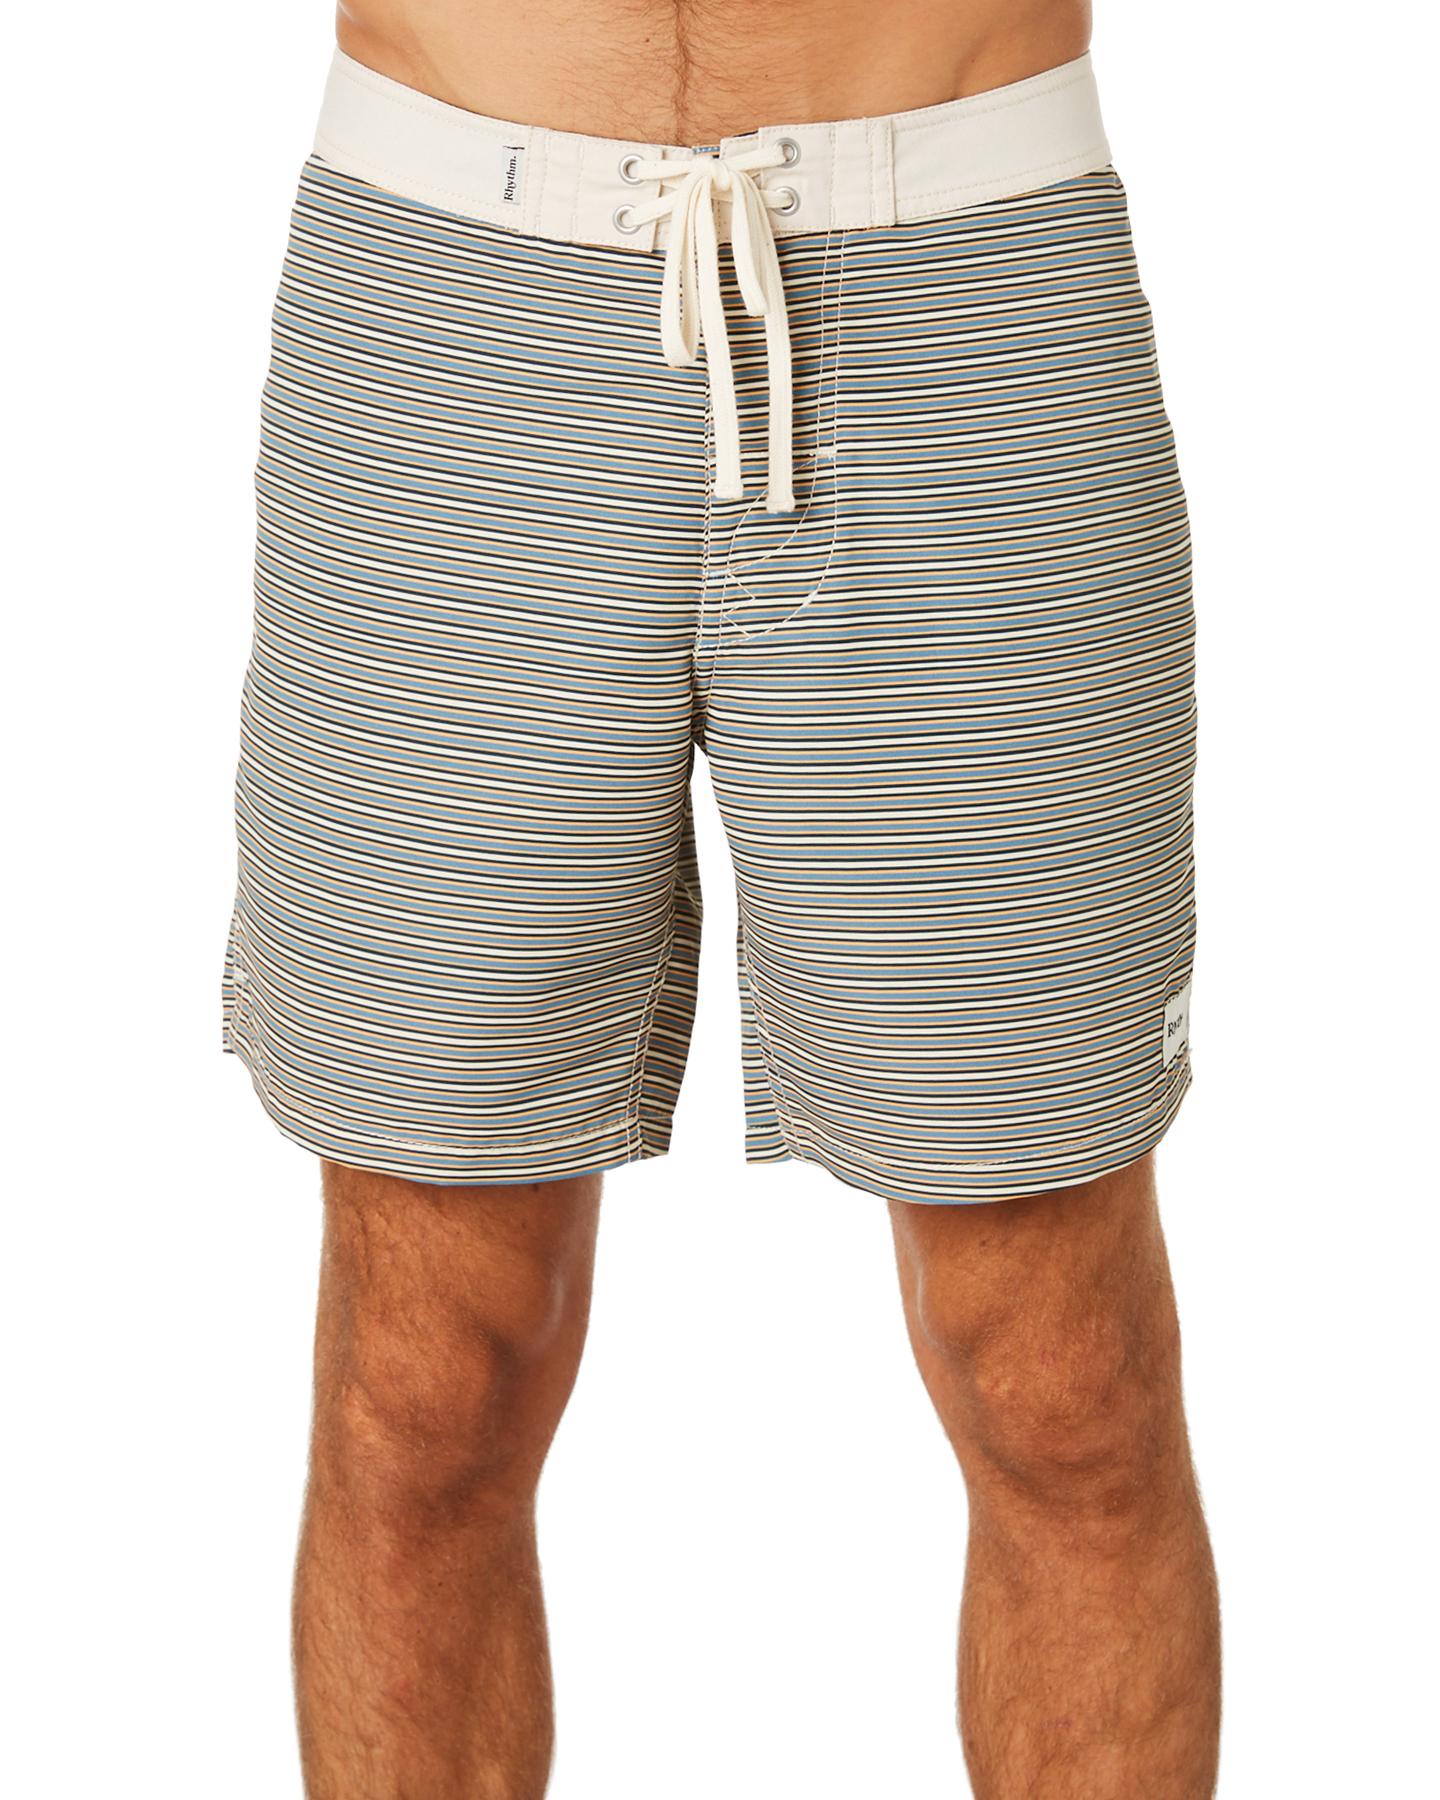 Rhythm Stripe Classic Fitted Men's Mens Boardshort About Details Black lcFJT3K1